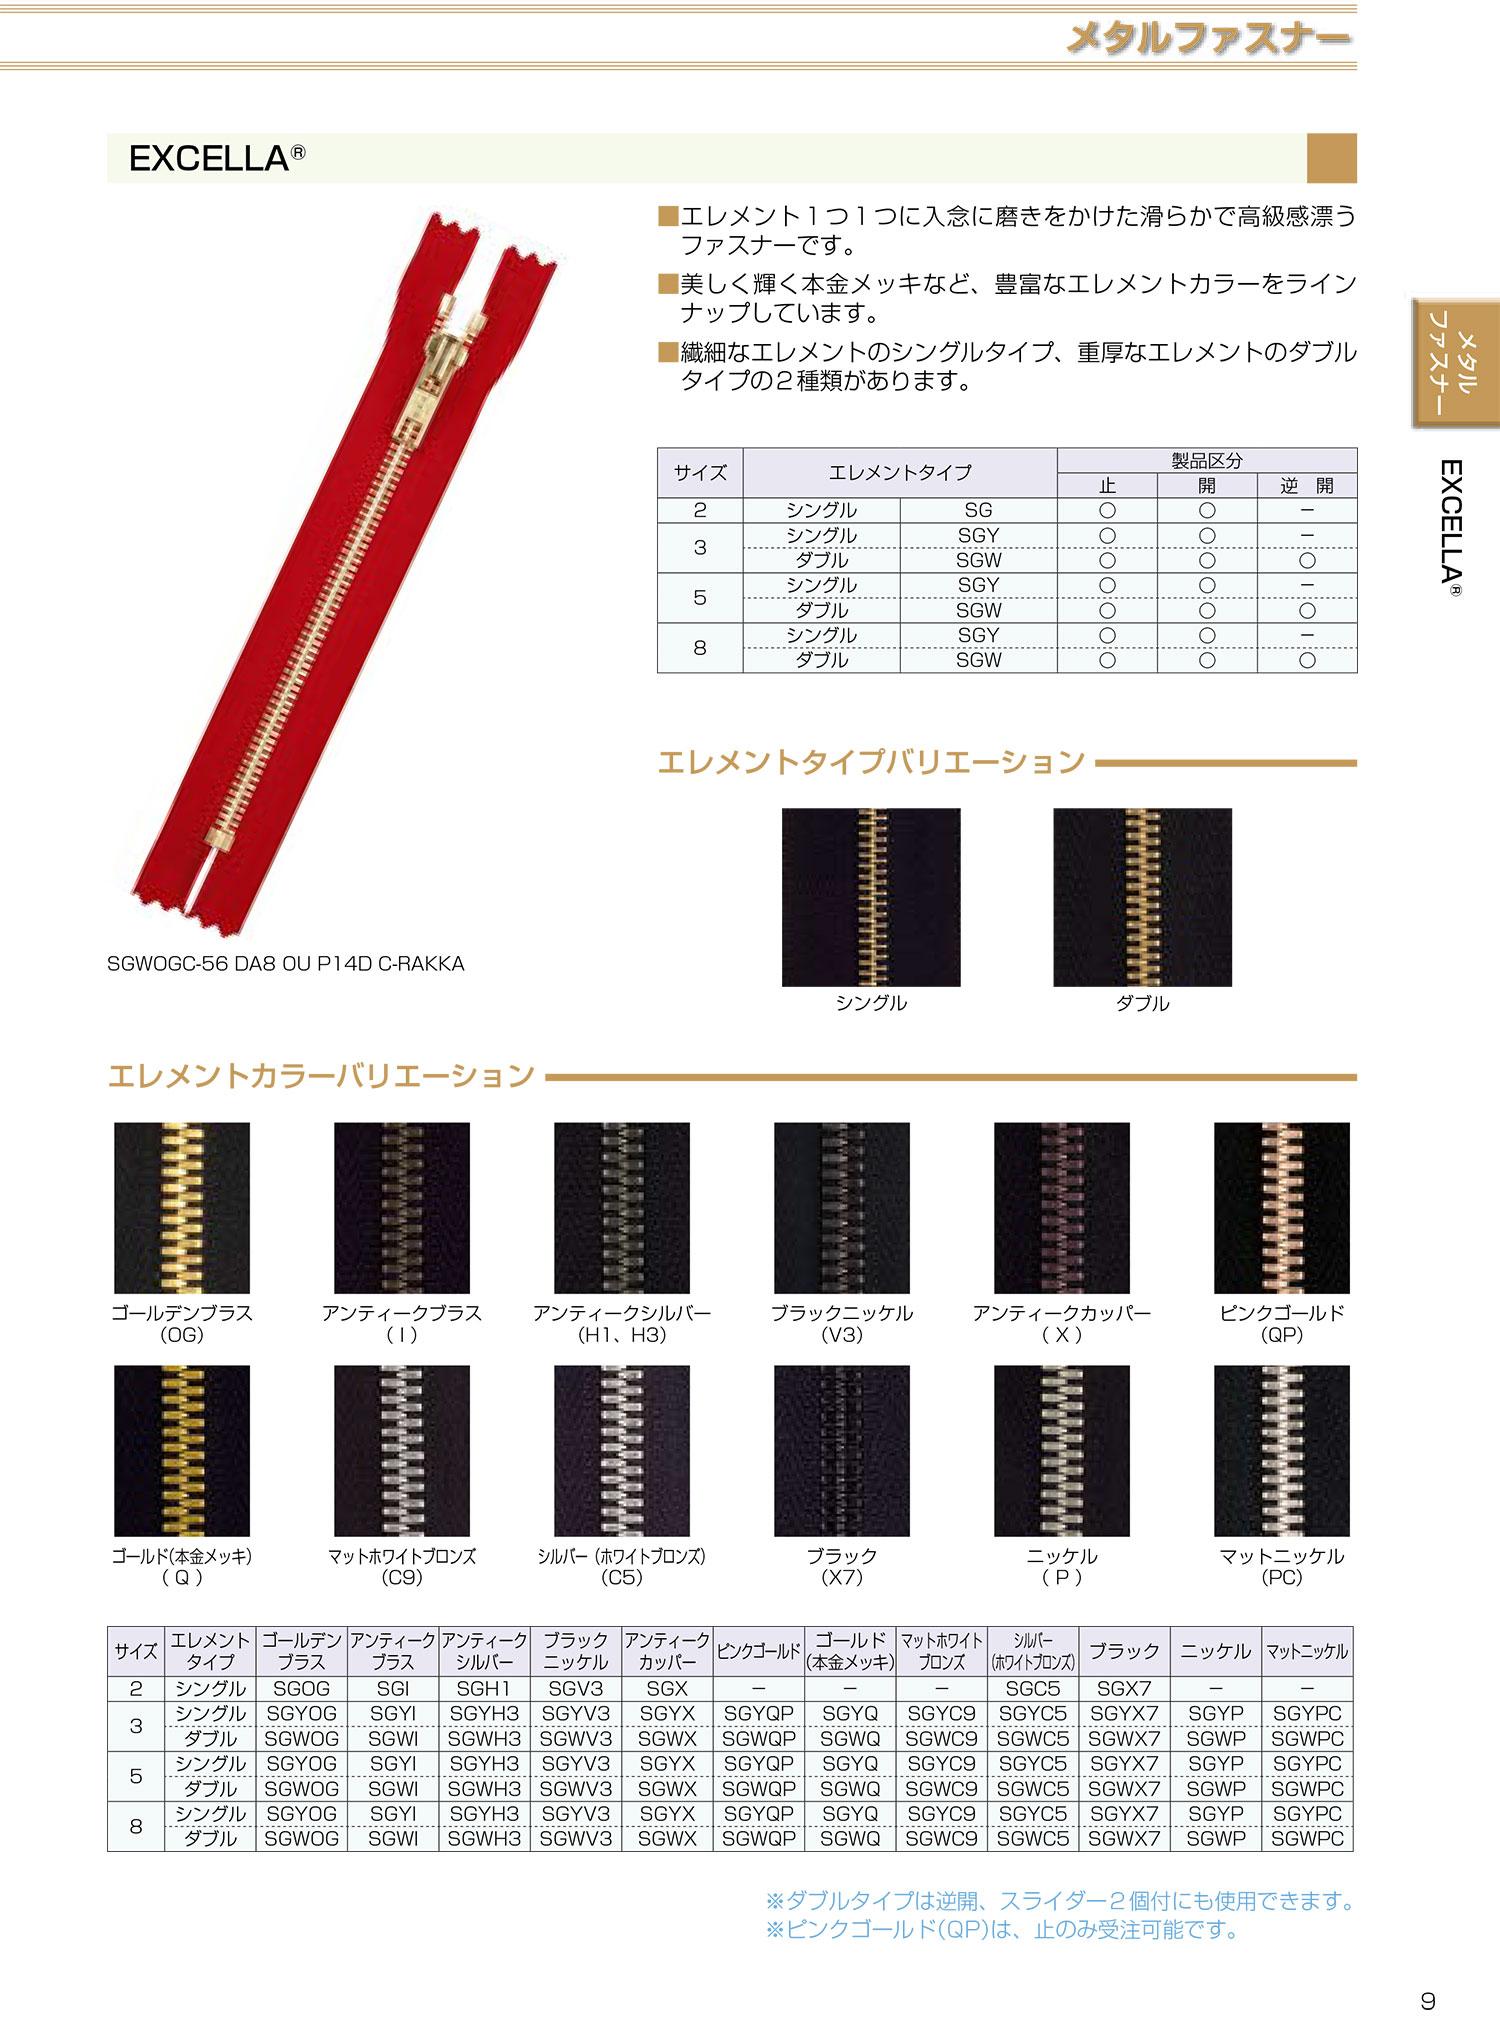 8SGWQMR エクセラ 8サイズ ゴールド(本金) 逆開 ダブル[ファスナー] YKK/オークラ商事 - ApparelX アパレル資材卸通販